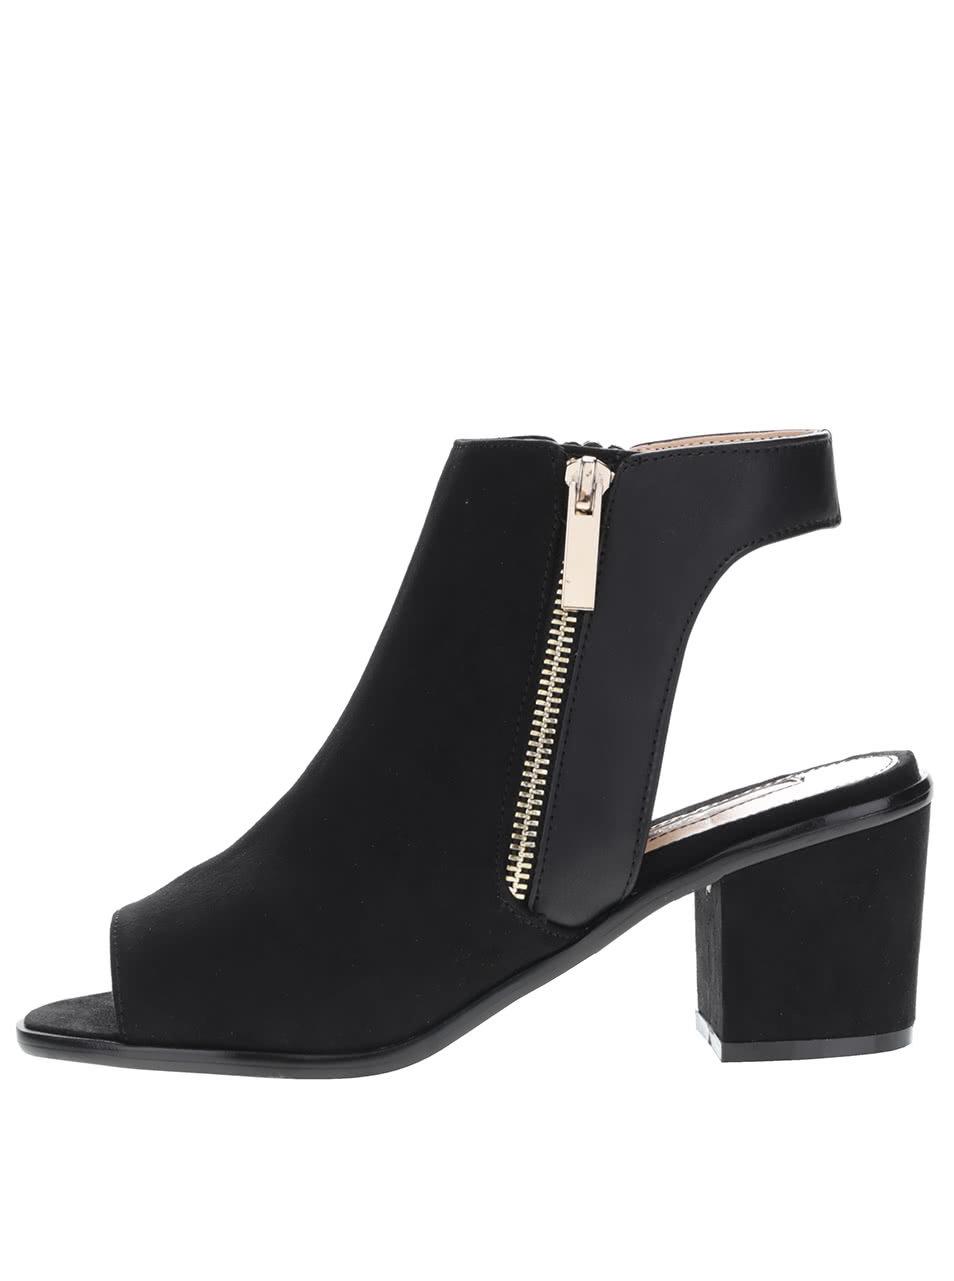 Čierne topánky s otvorenou špičkou a pätou v semišovej úprave Miss Selfridge  ... abfa6346b57